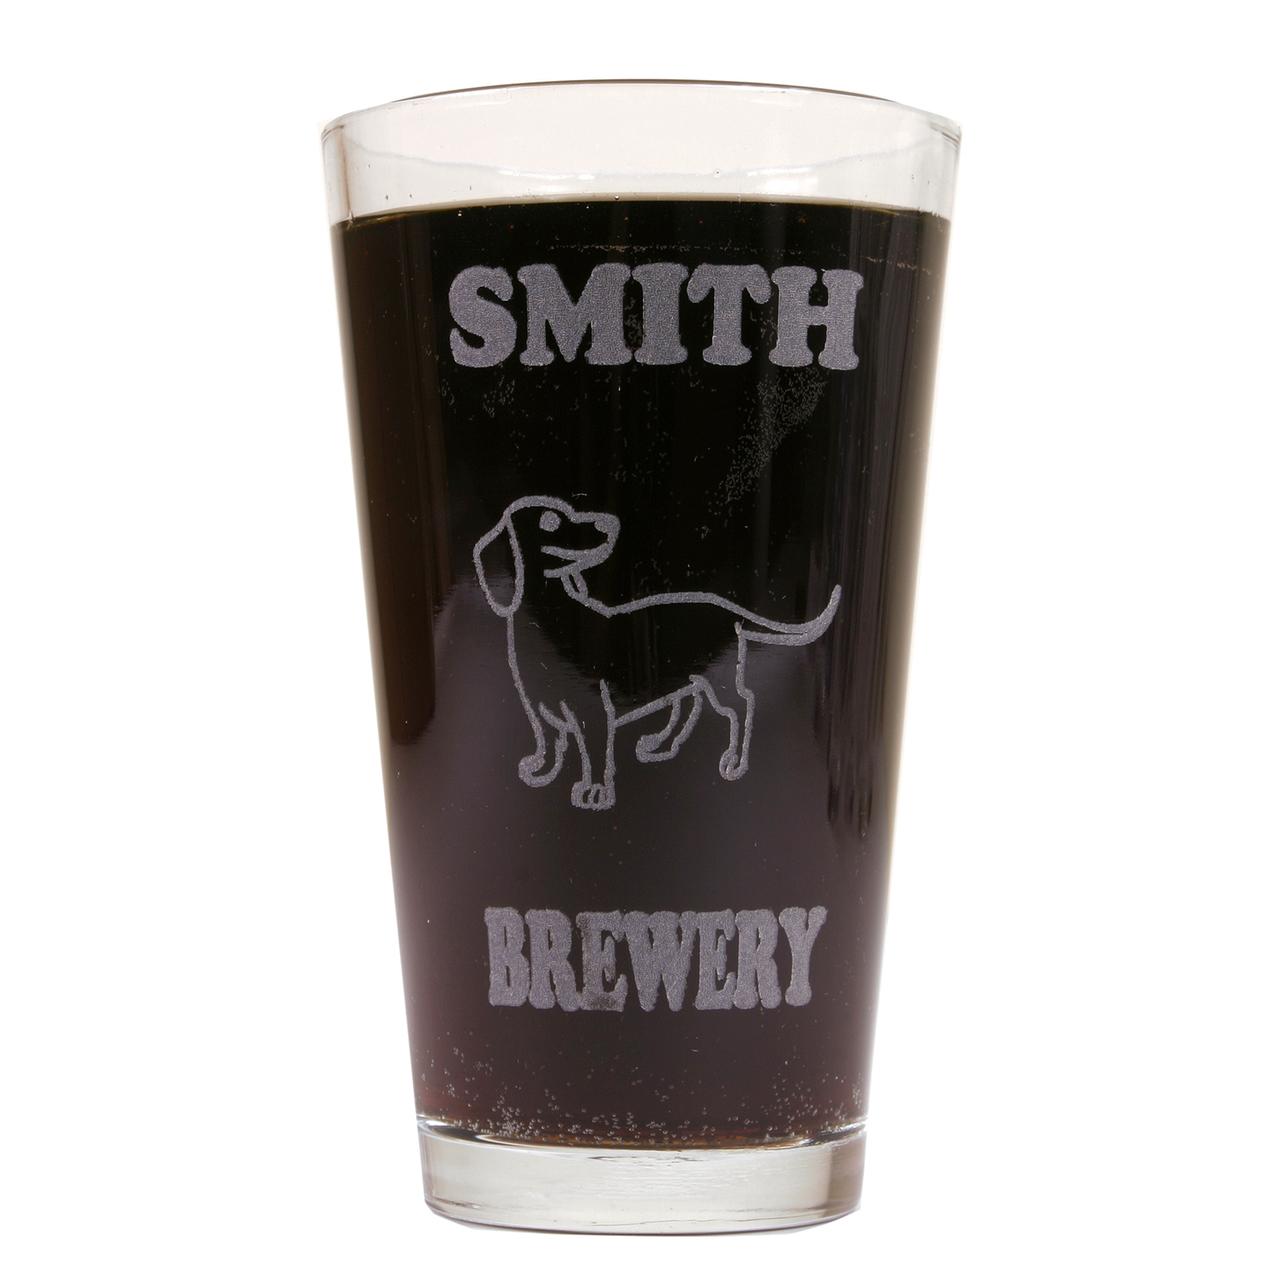 Hot Dog Personalized Pint Glass Beer Mug - Dachshund